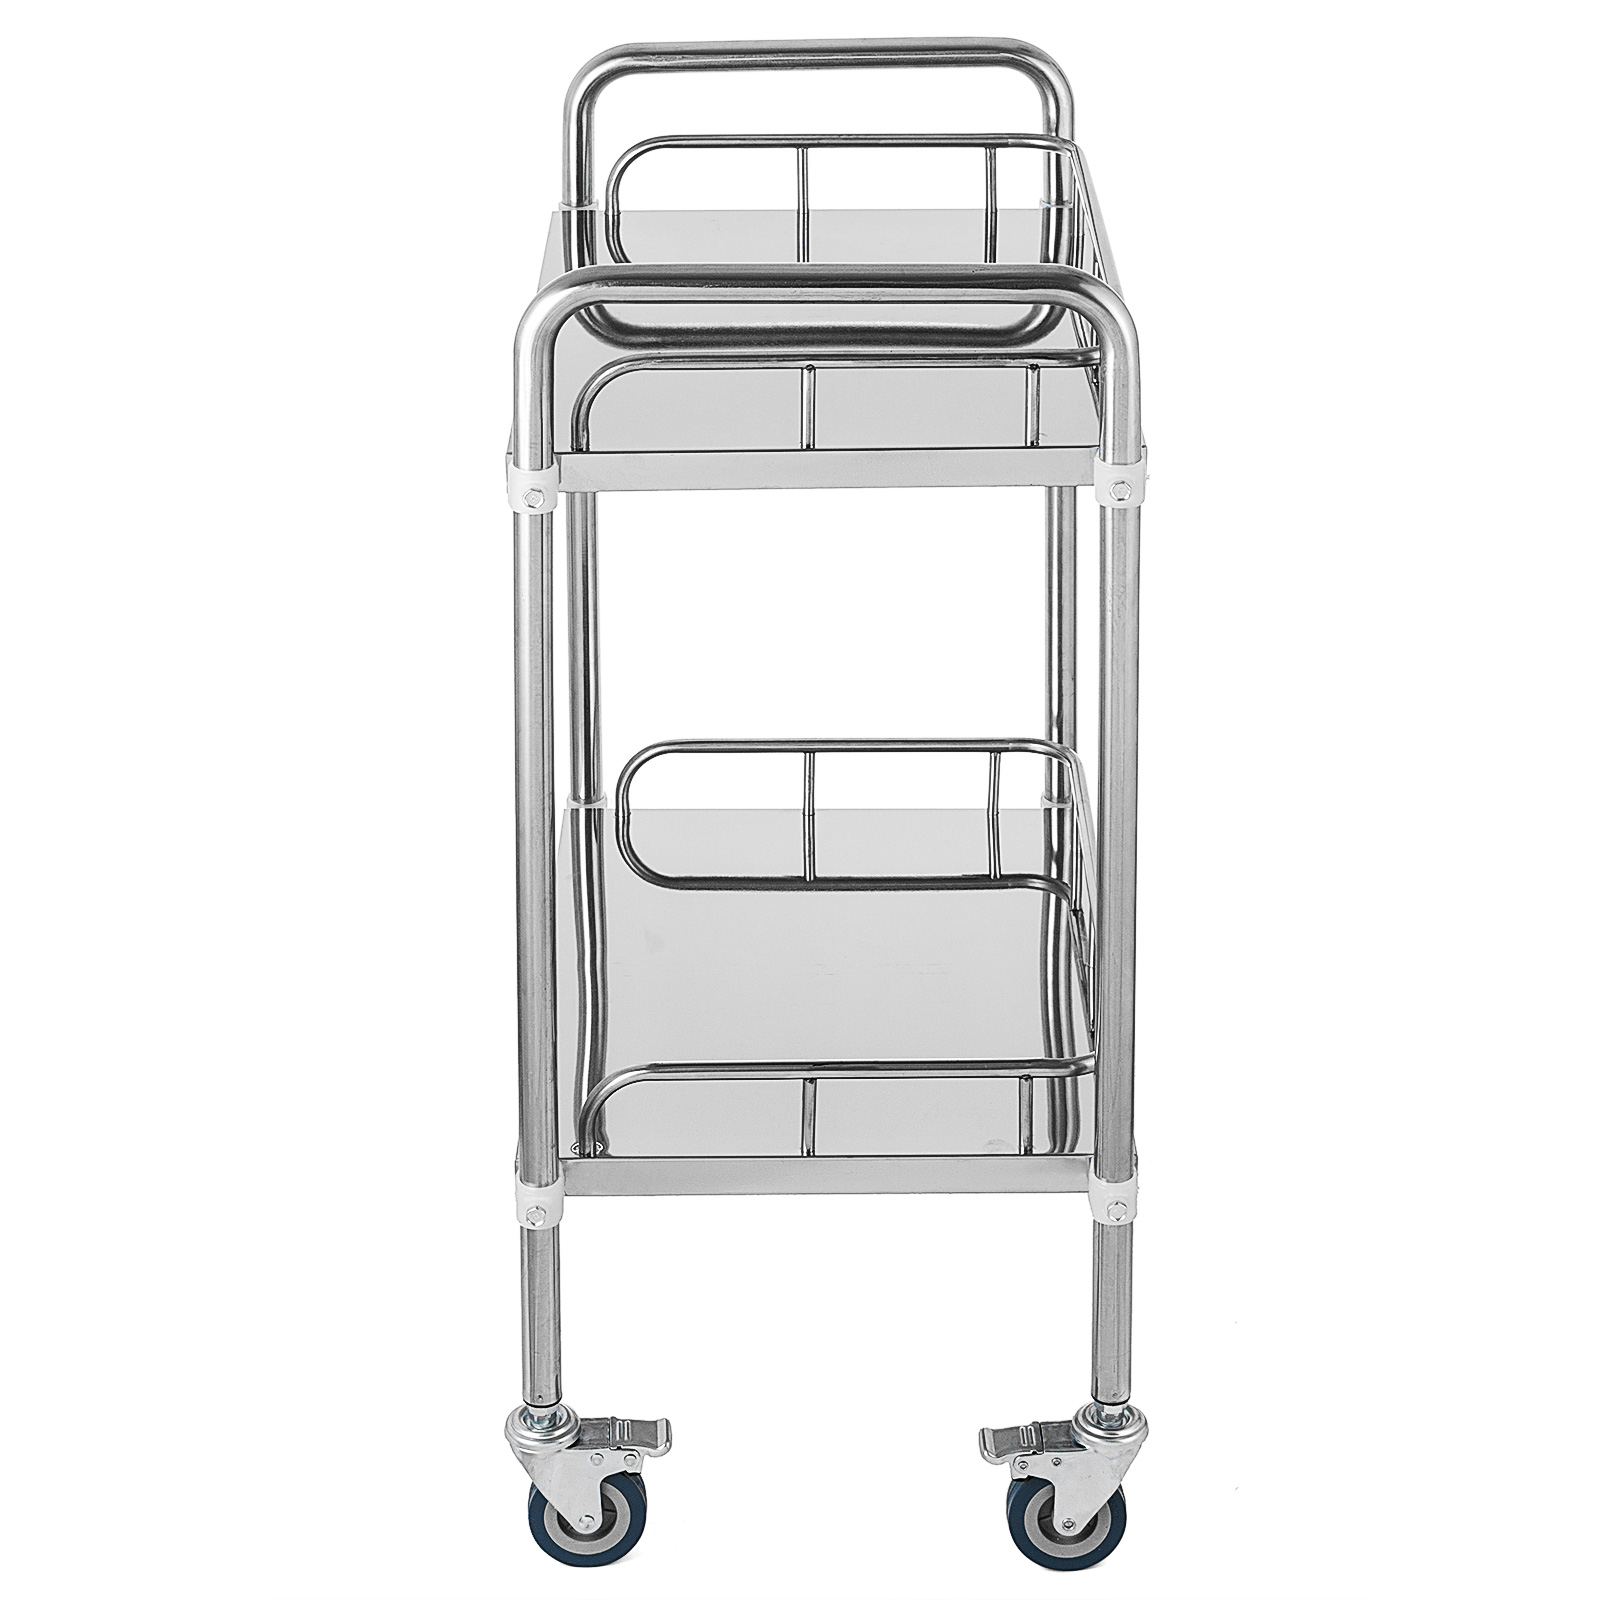 thumbnail 16 - Rolling Storage Cart Medical Salon Trolley Pedestal Rolling Cart Stainless Steel